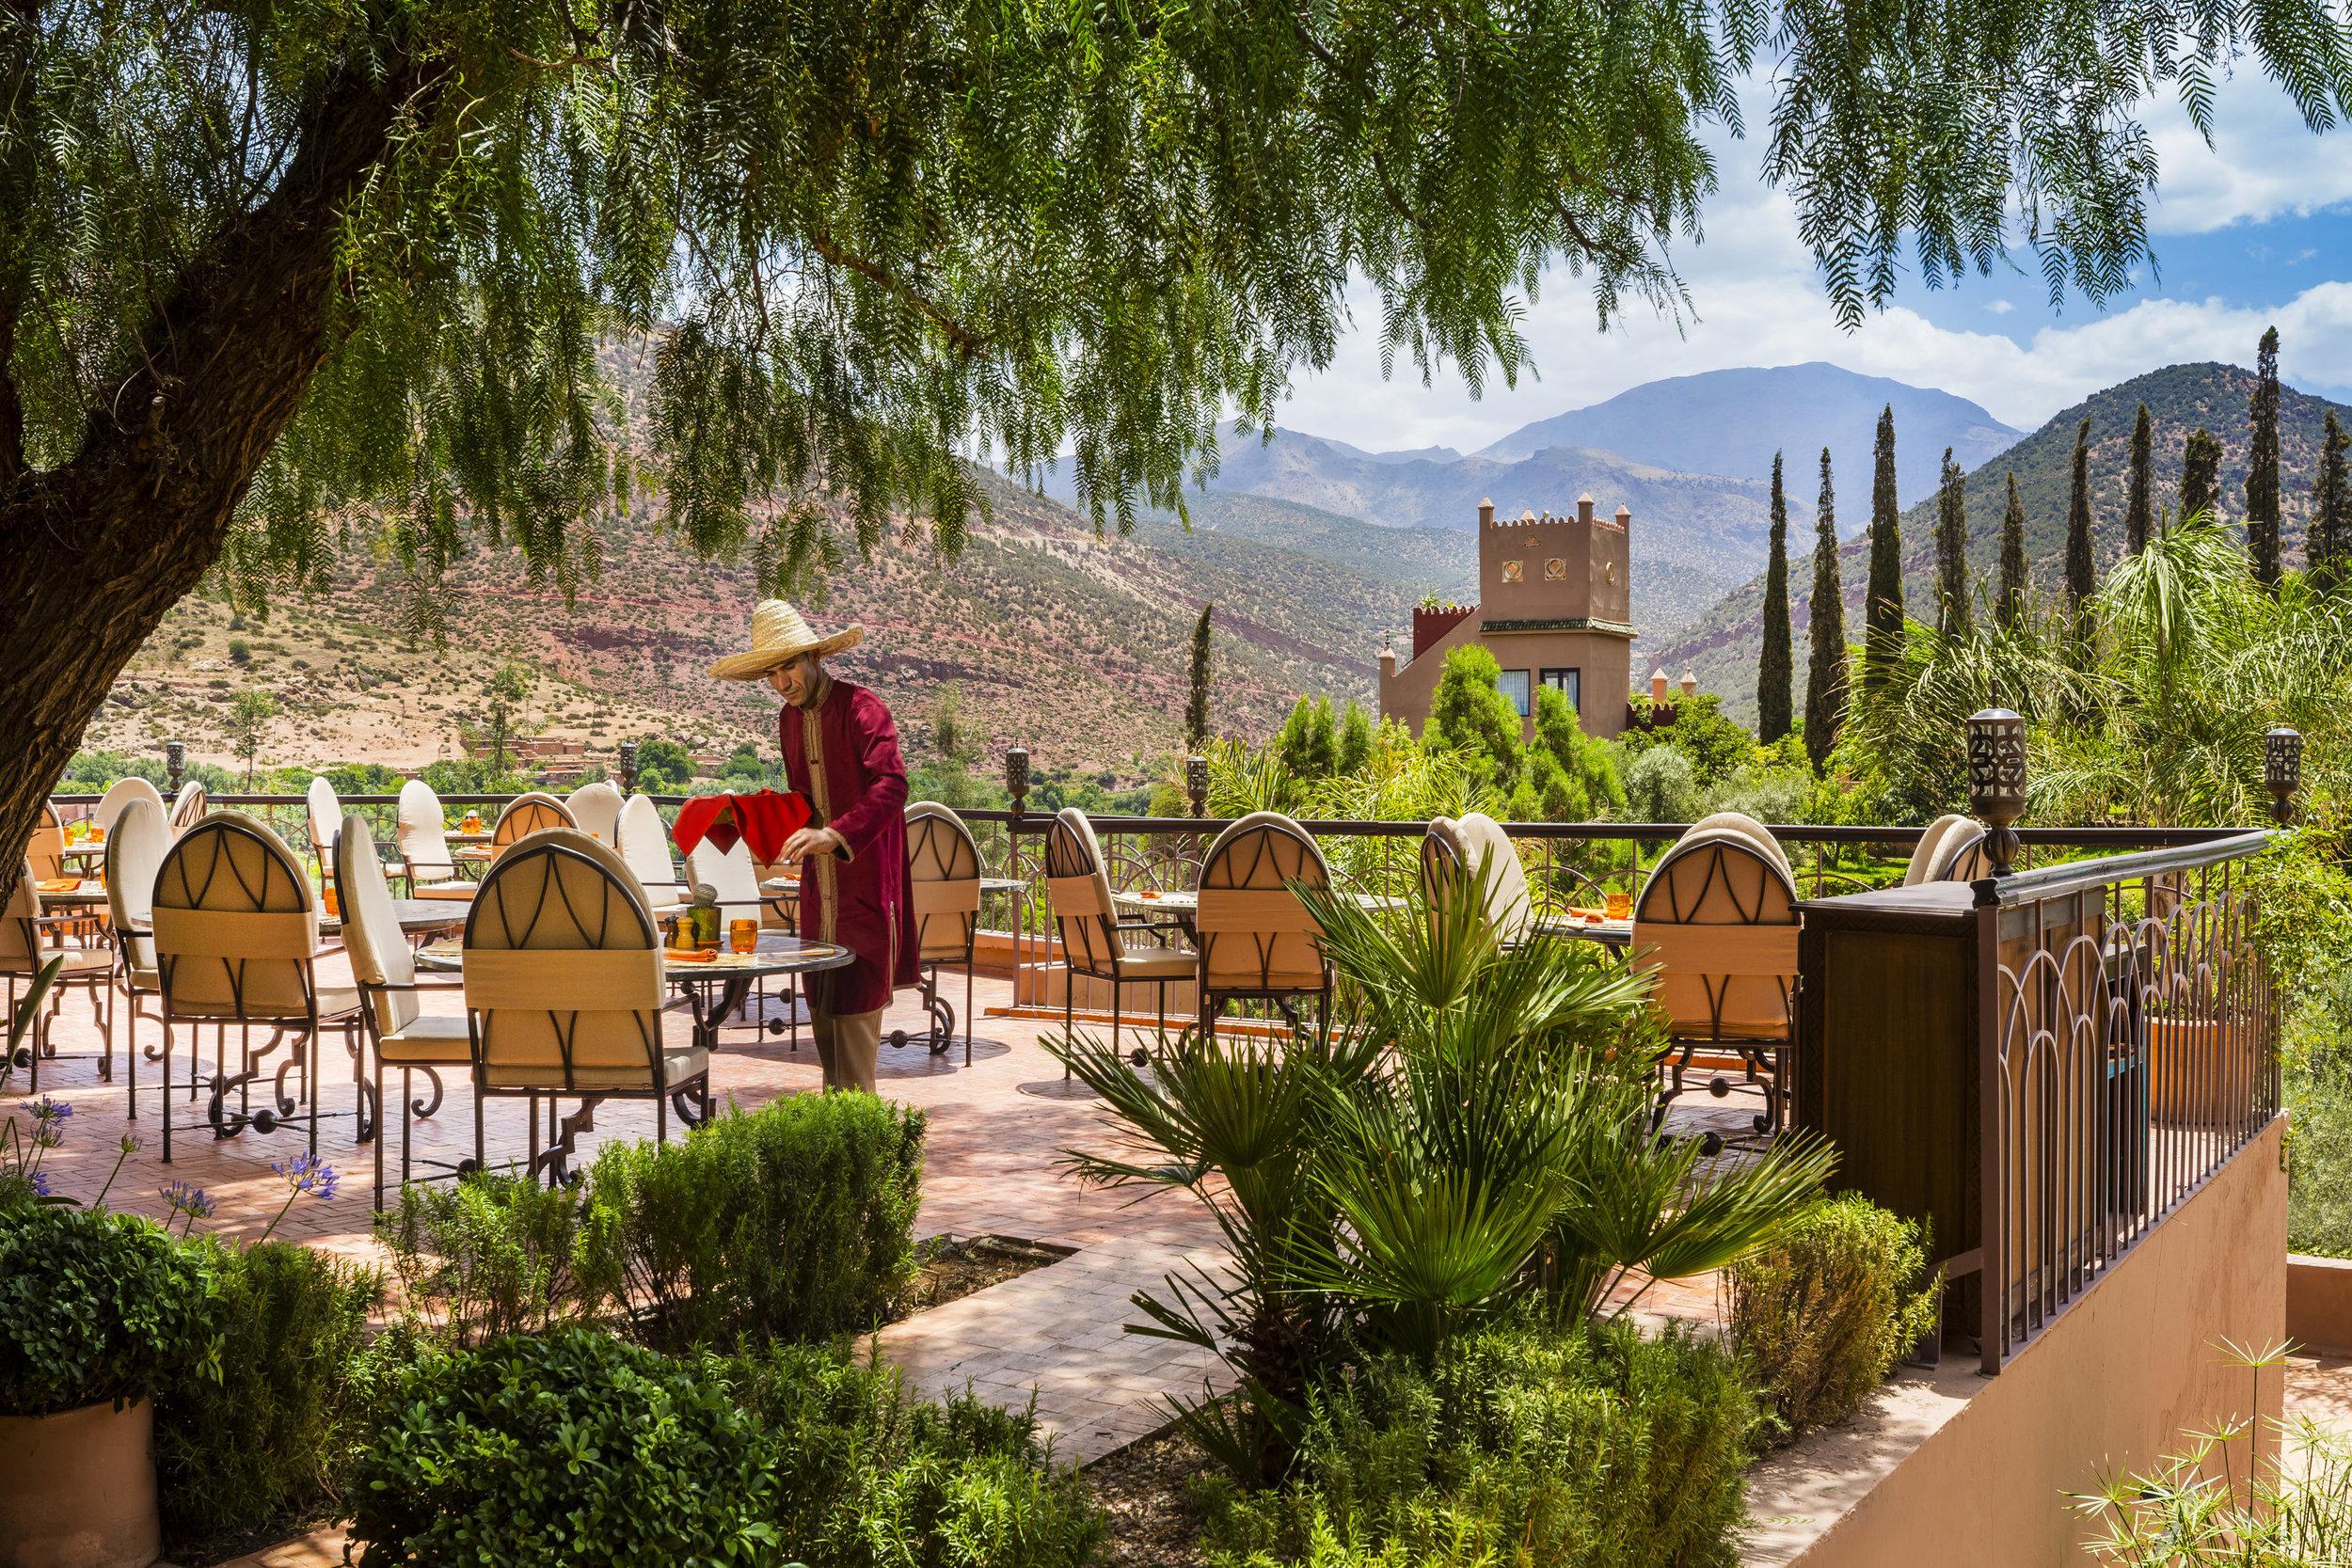 rsz_kasbah_tamadot_outdoor_dining_5.jpg